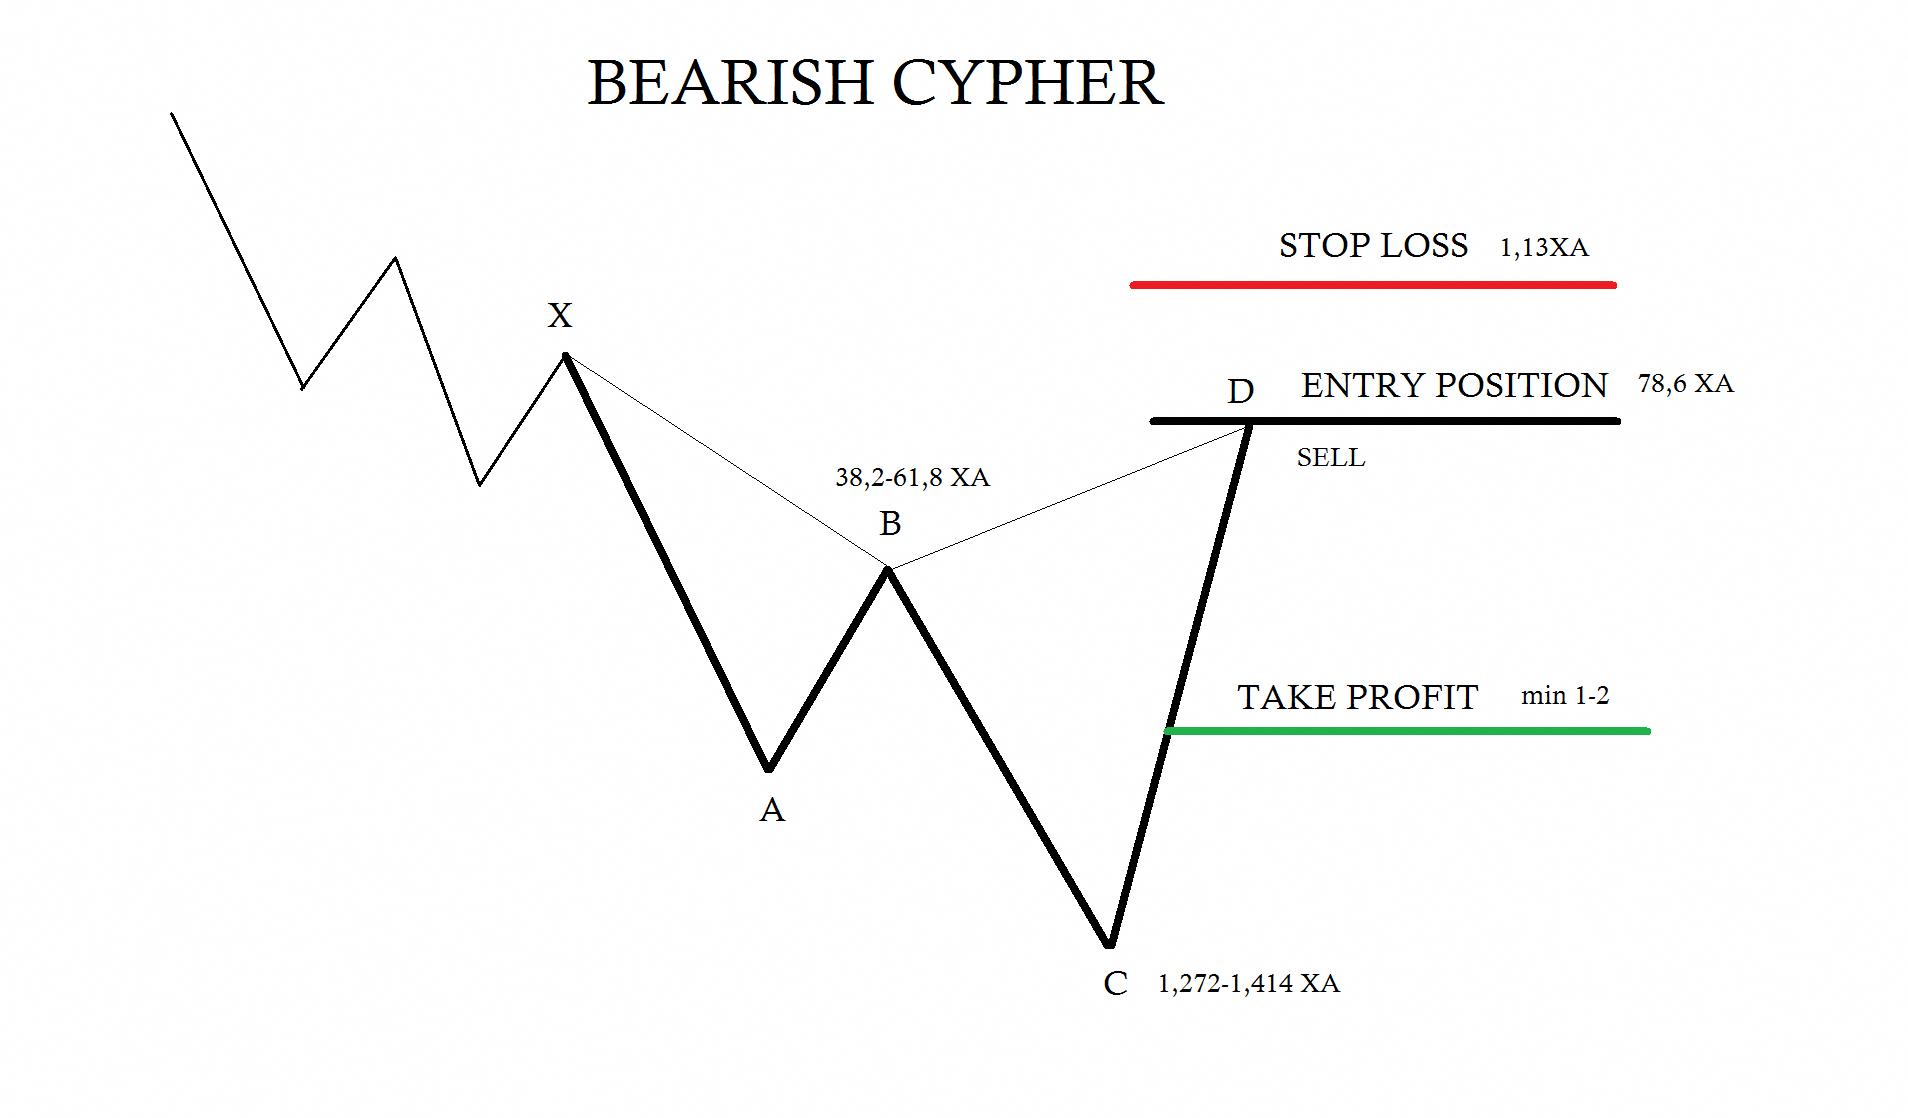 Bearish Cypher Trading Rules Forex Trading Harmonic Patterns -